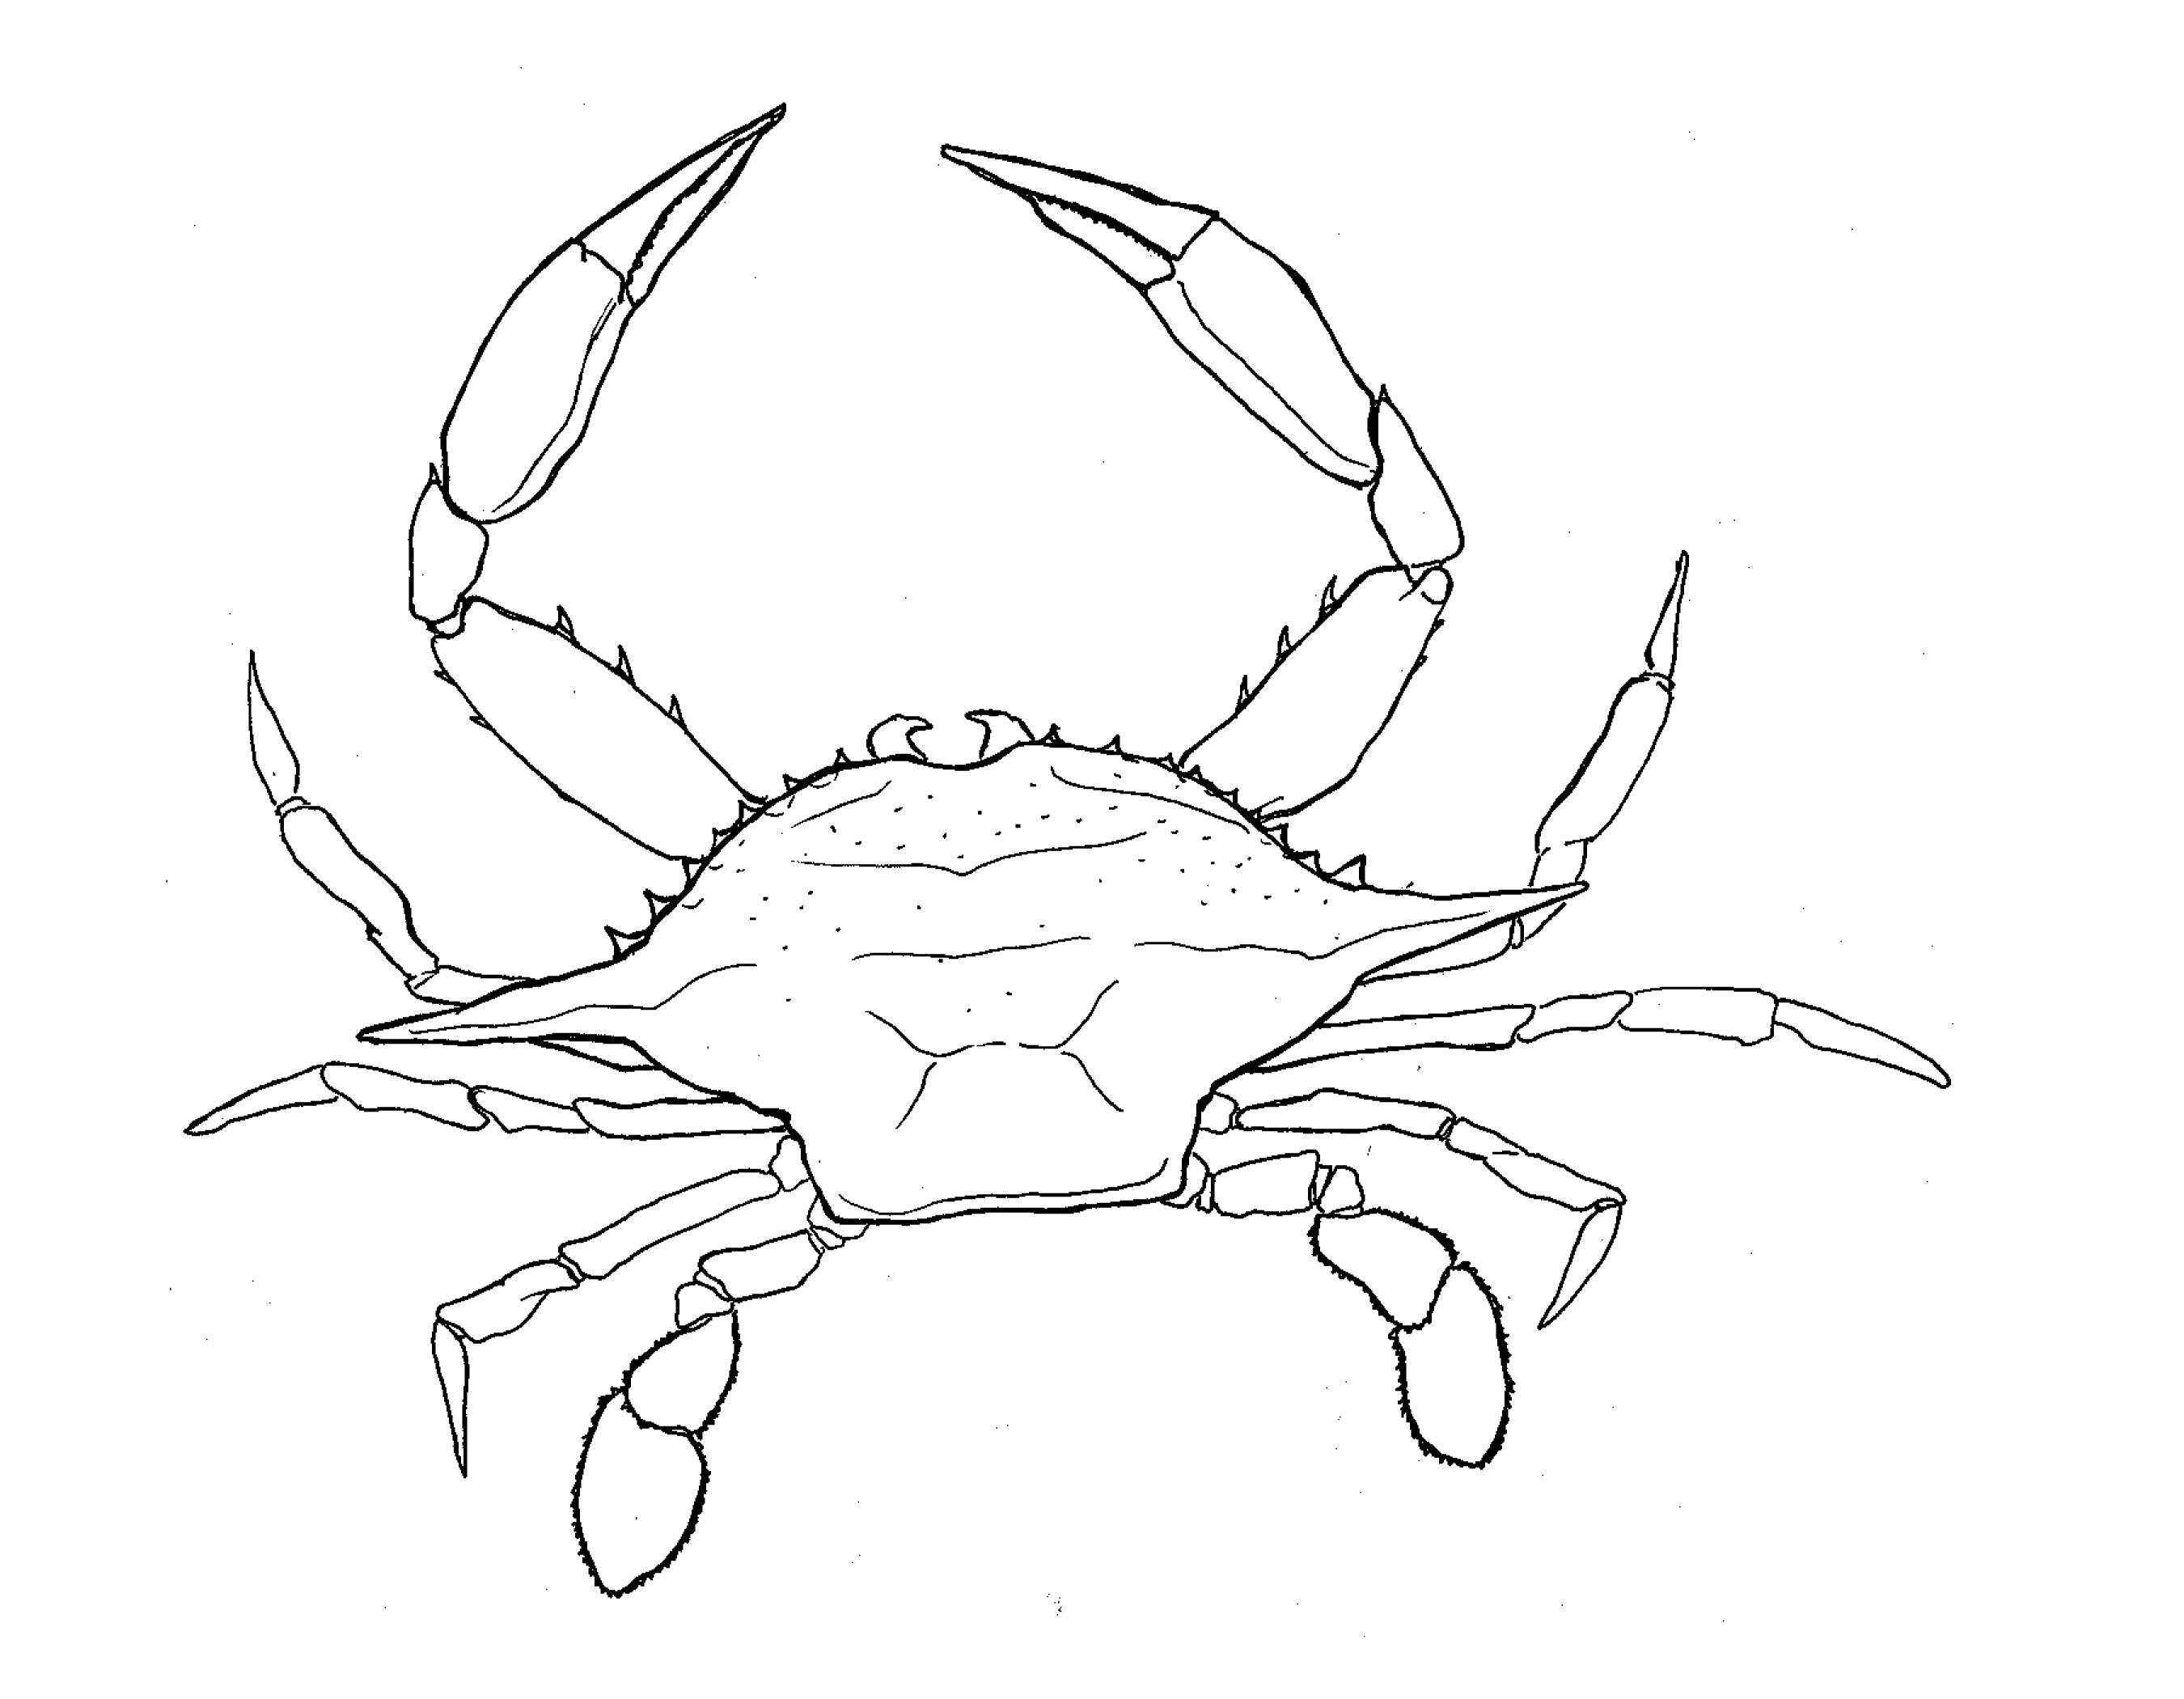 2700x2100 N'East Illustrated Chesapeake Bay Blue Crab N'East Style